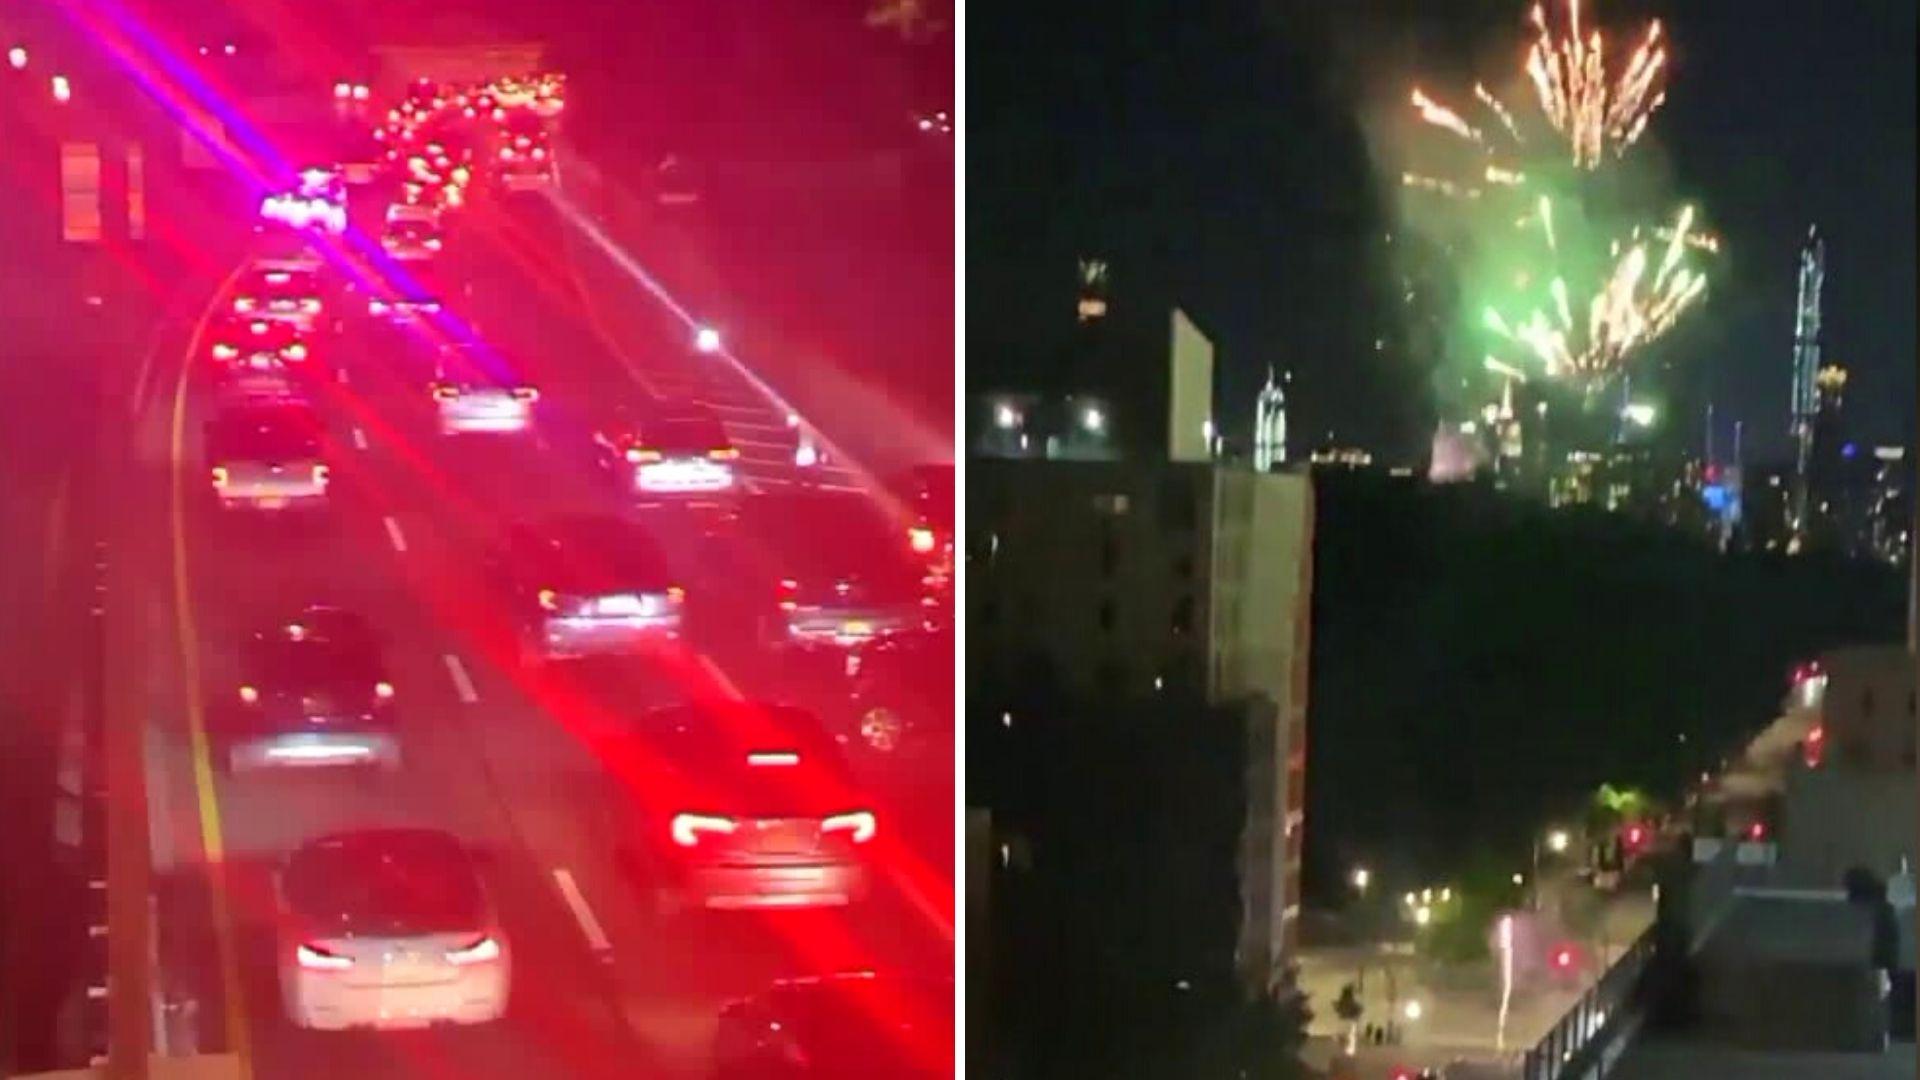 Fireworks protest outside Mayor Bill de Blasio's Gracie Mansion on Upper East Side